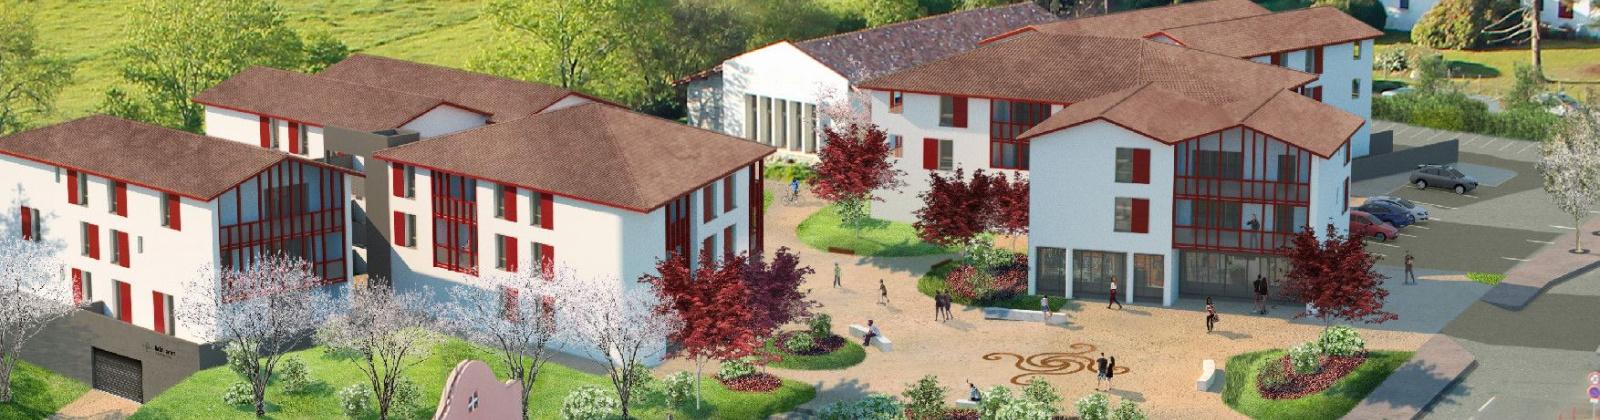 Quartier Arrauntz, Ustaritz, France 64480, 1 Chambre Chambres,Bureau,Volume amenageable,Quartier Arrauntz,1332